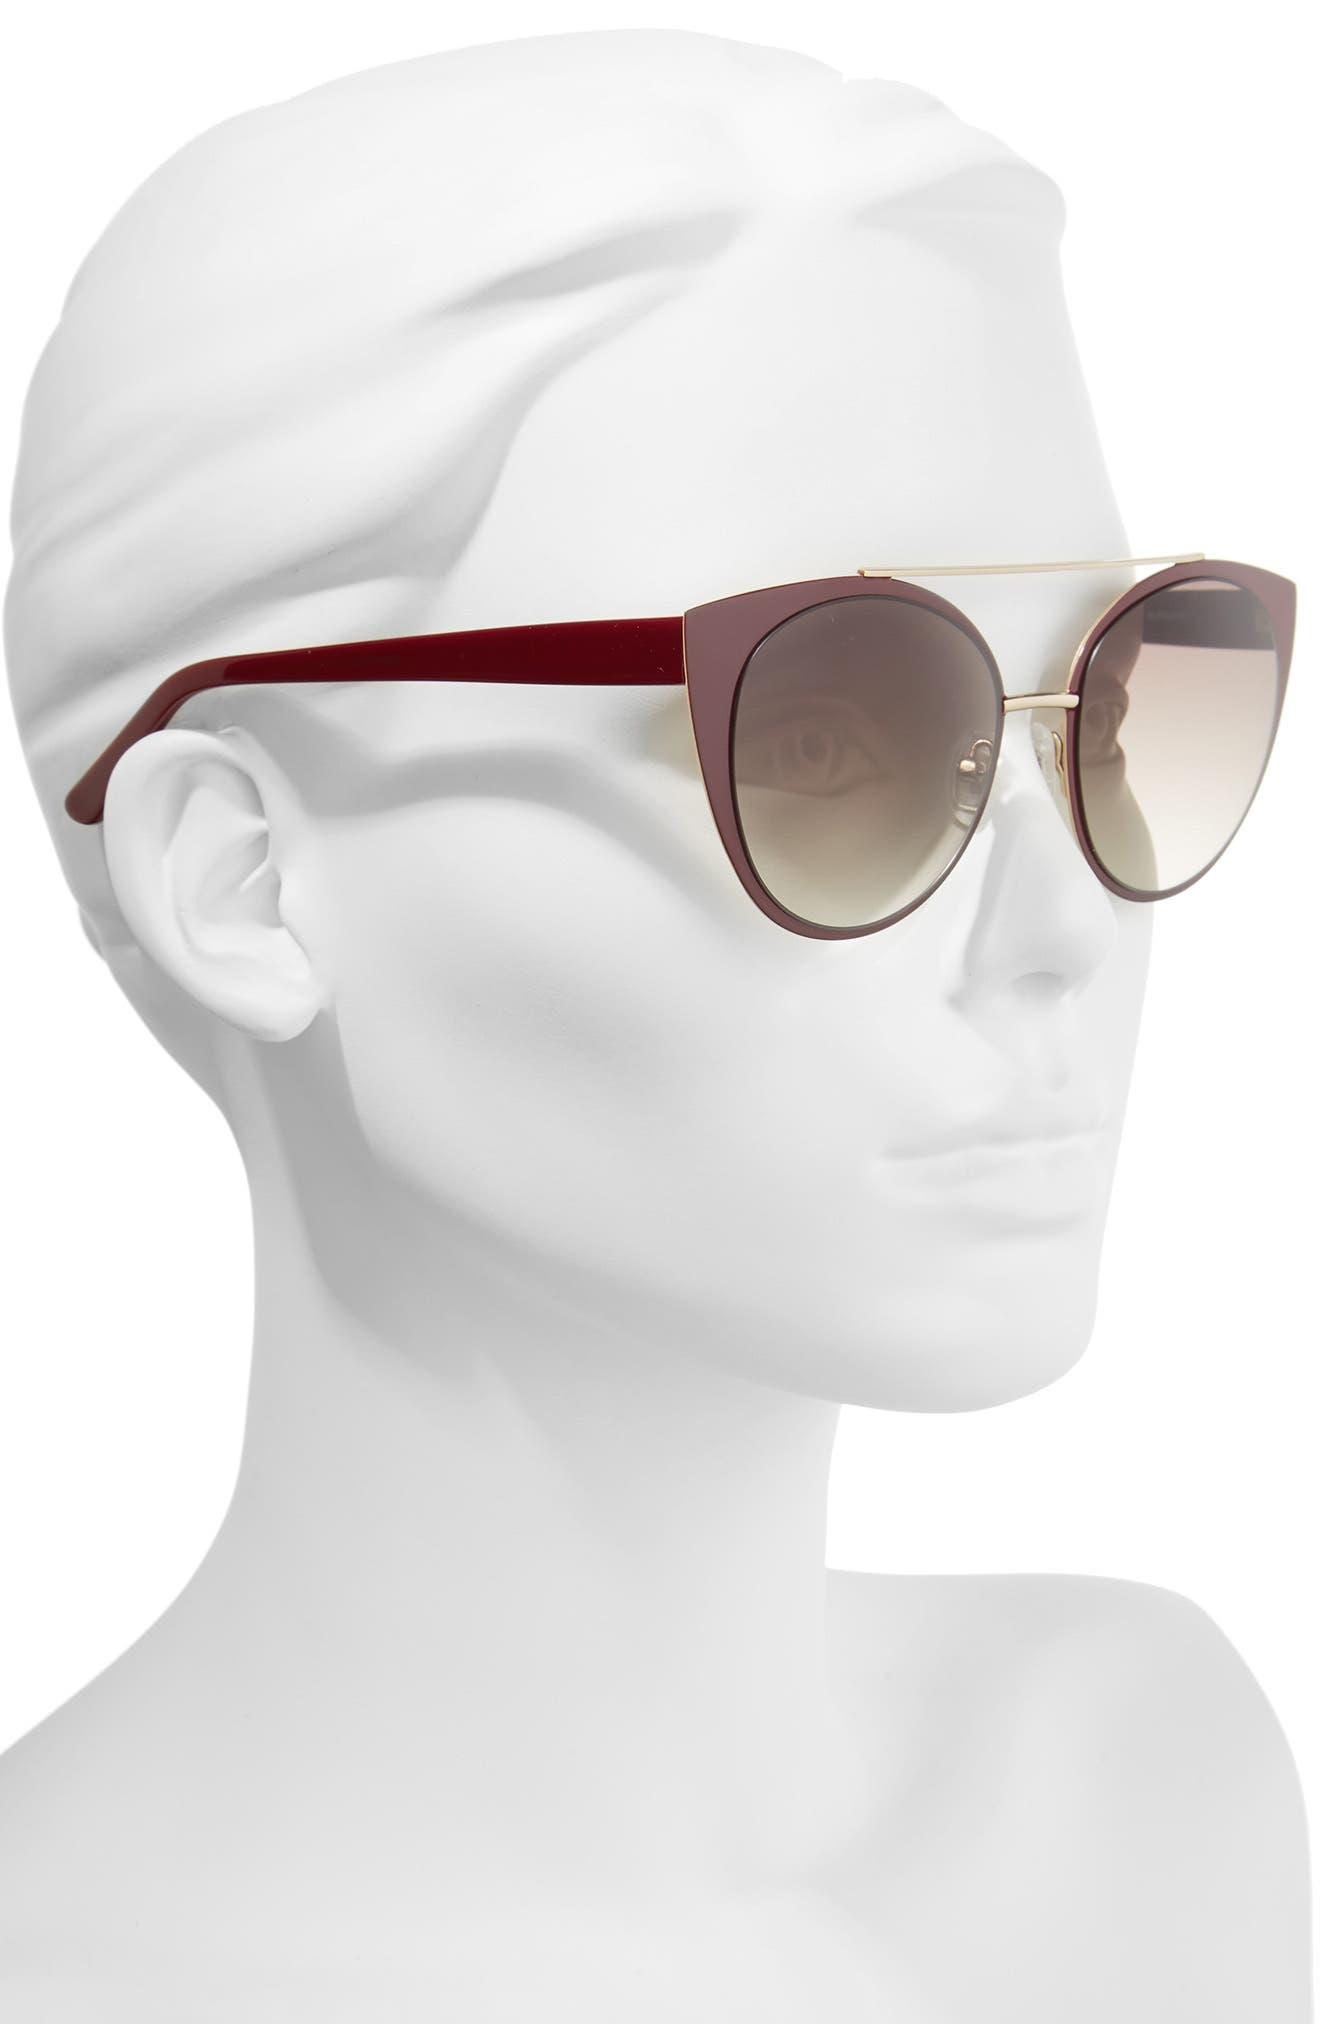 Amelia 53mm Aviator Sunglasses,                             Alternate thumbnail 2, color,                             930